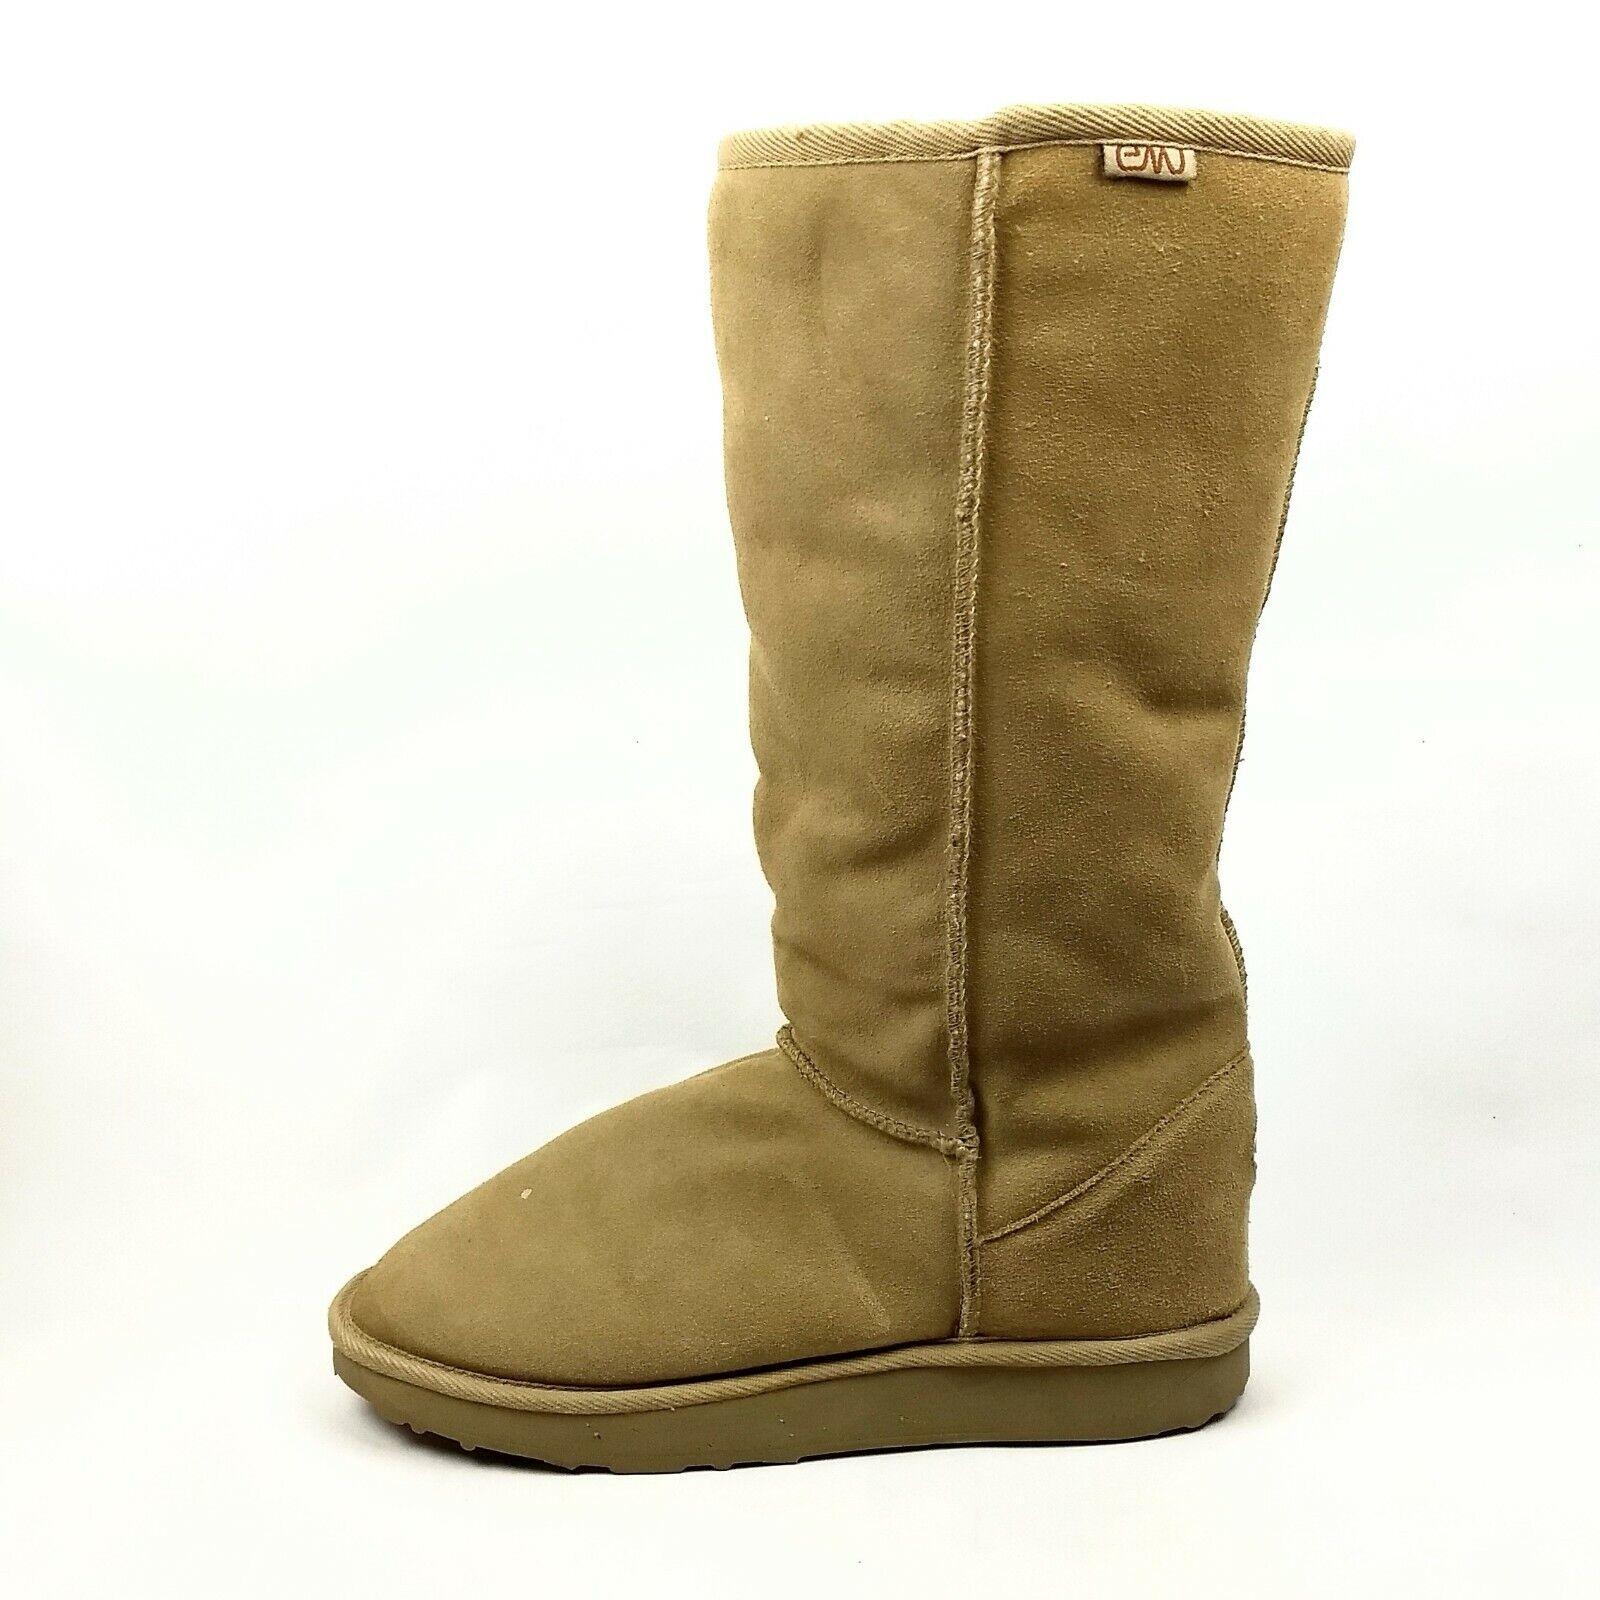 Emu Australia Winter Sheepskin Boots Womens Size 10 Tan Washable Wool Shearling